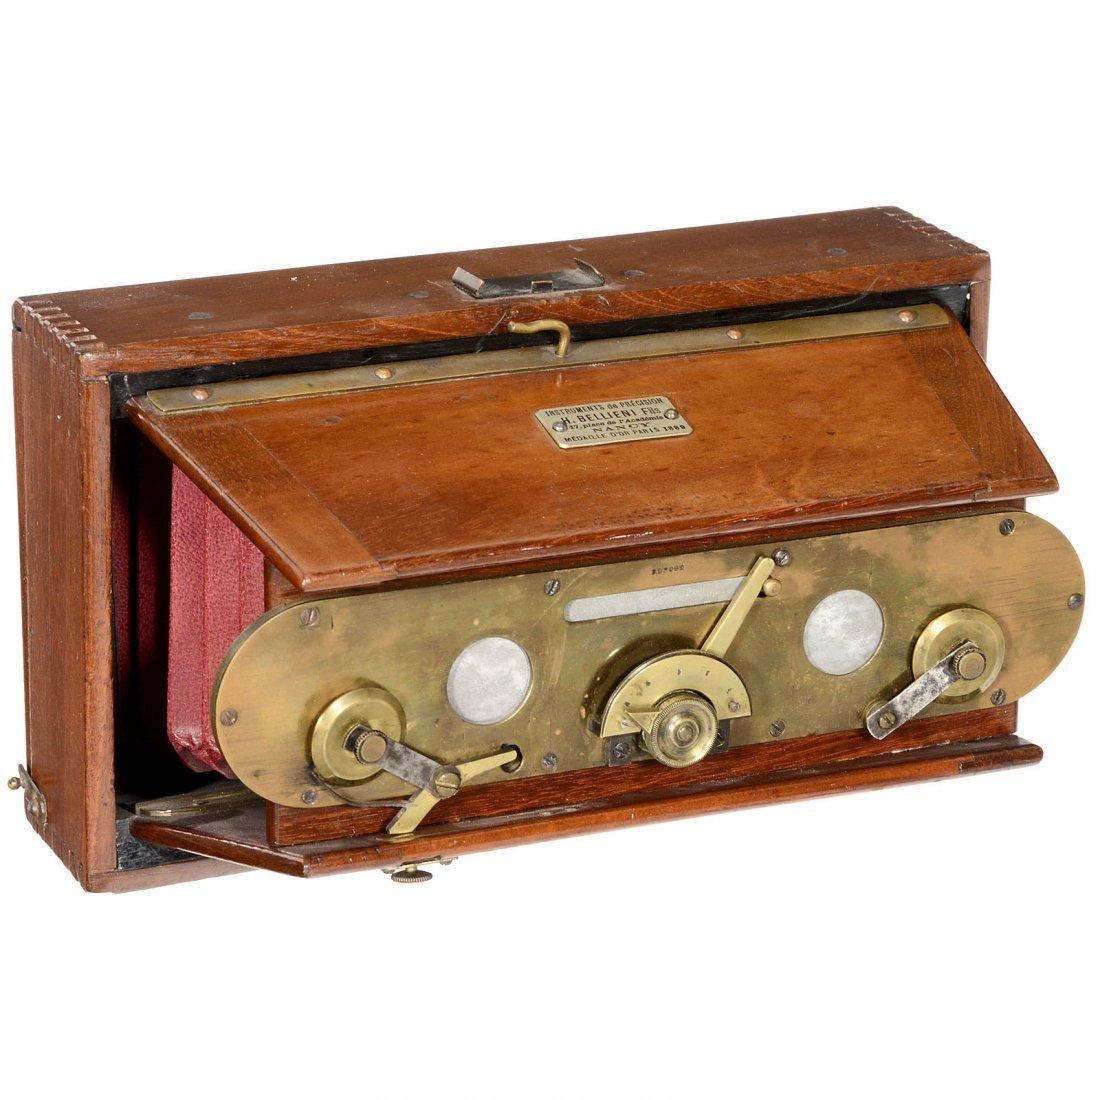 Bellieni Stereo Folding Camera, 1892